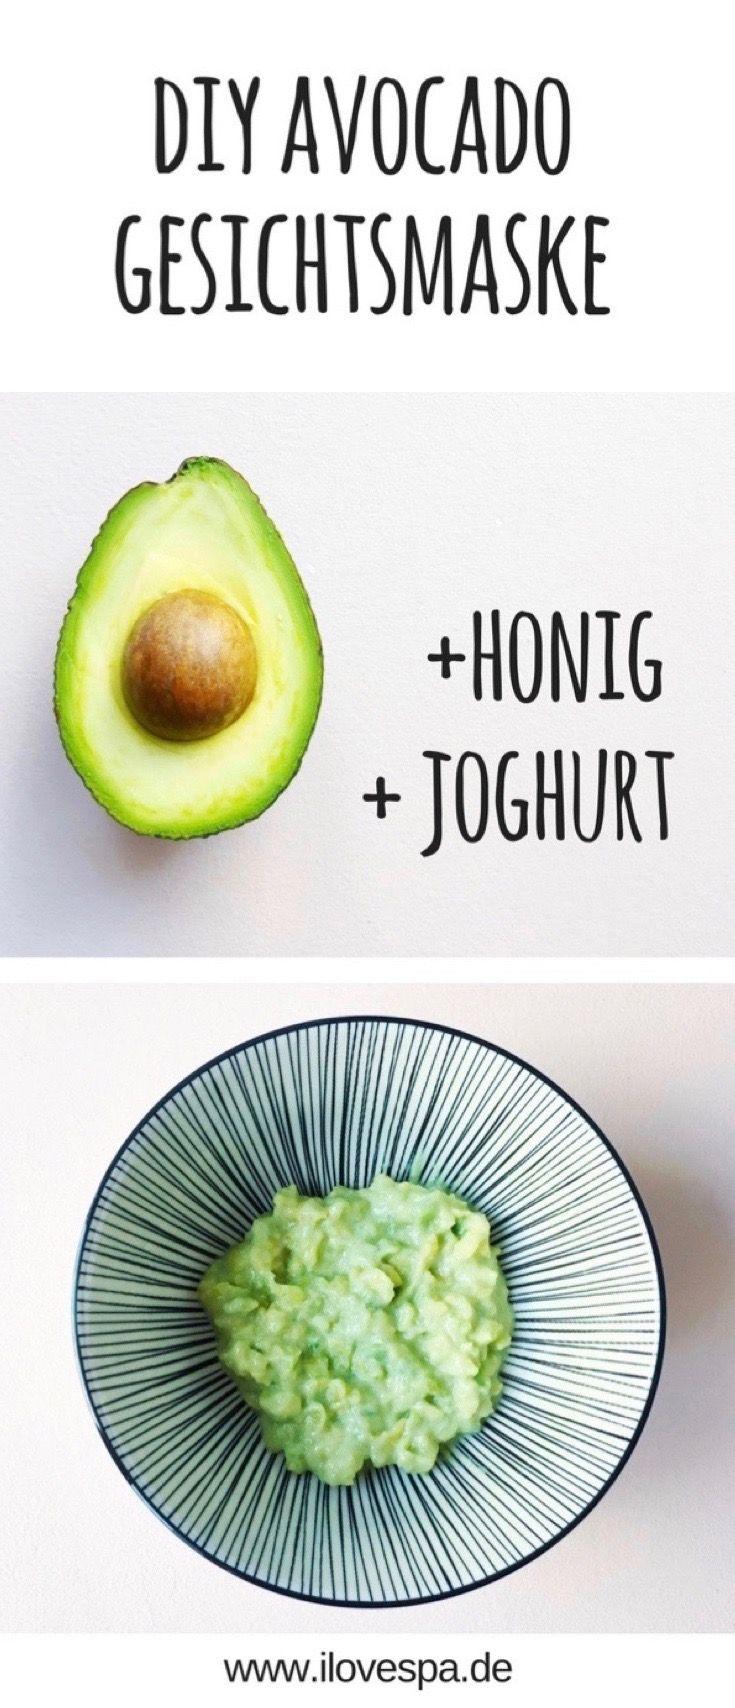 diy avocado maske selber machen perfekt geeignet f r trockene haut gesichtsmaske selber. Black Bedroom Furniture Sets. Home Design Ideas